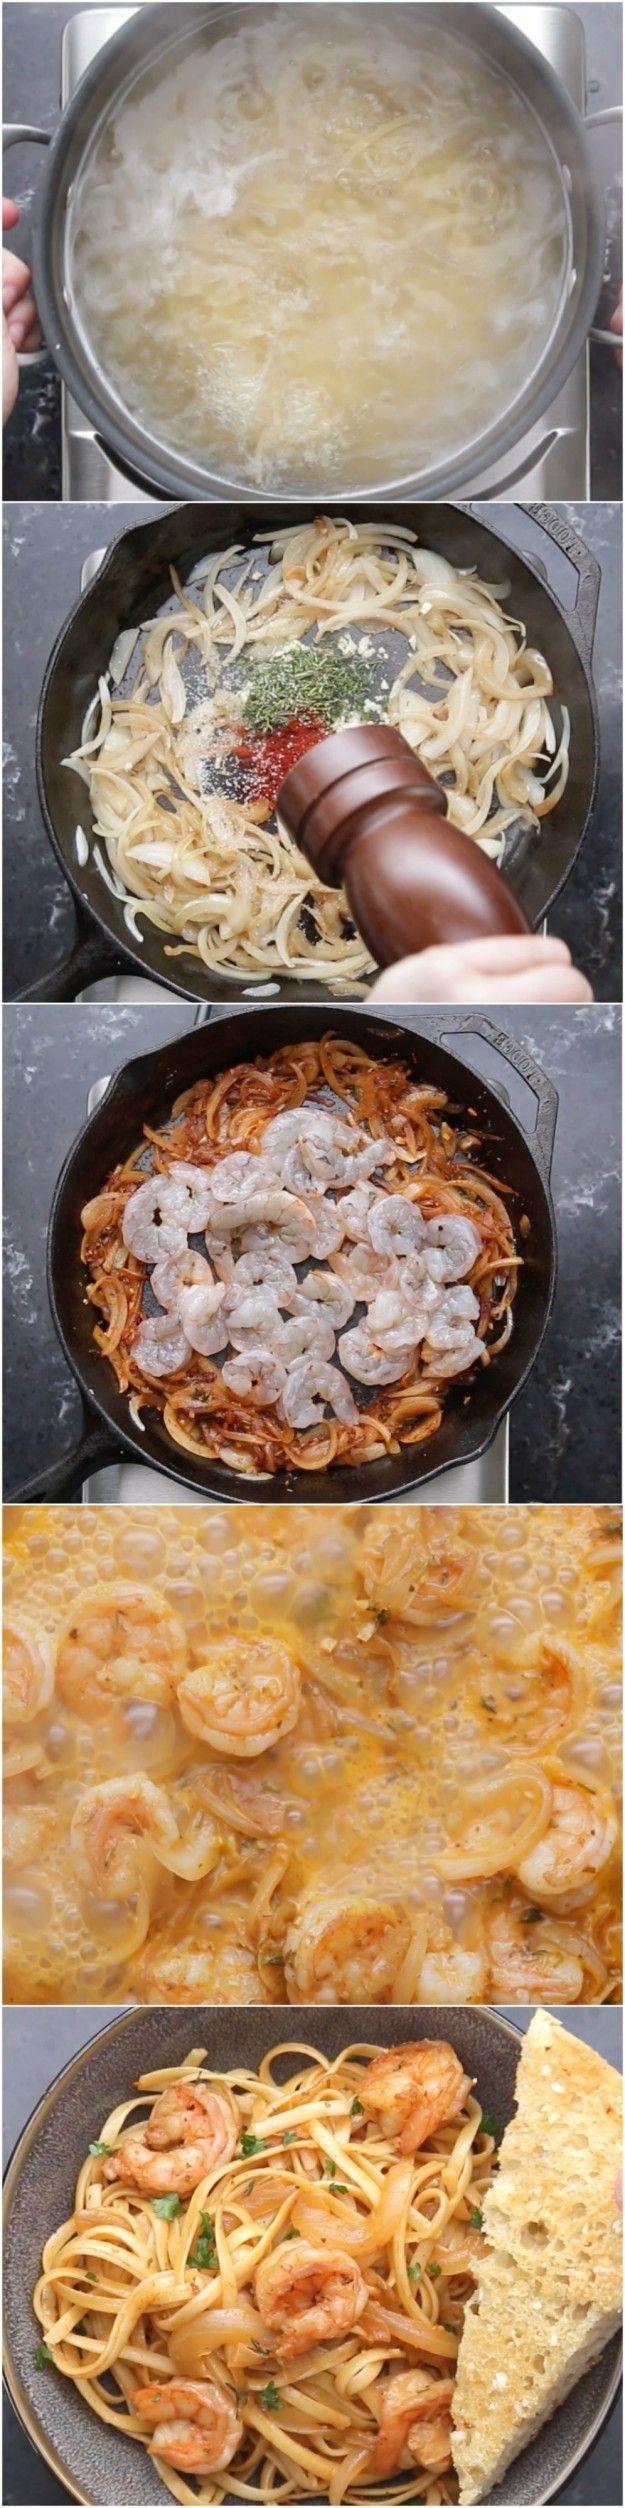 Lemon Paprika Shrimp Pasta | This Lemon Paprika Shrimp Pasta Is Totally What You're Making For Dinner Tonight